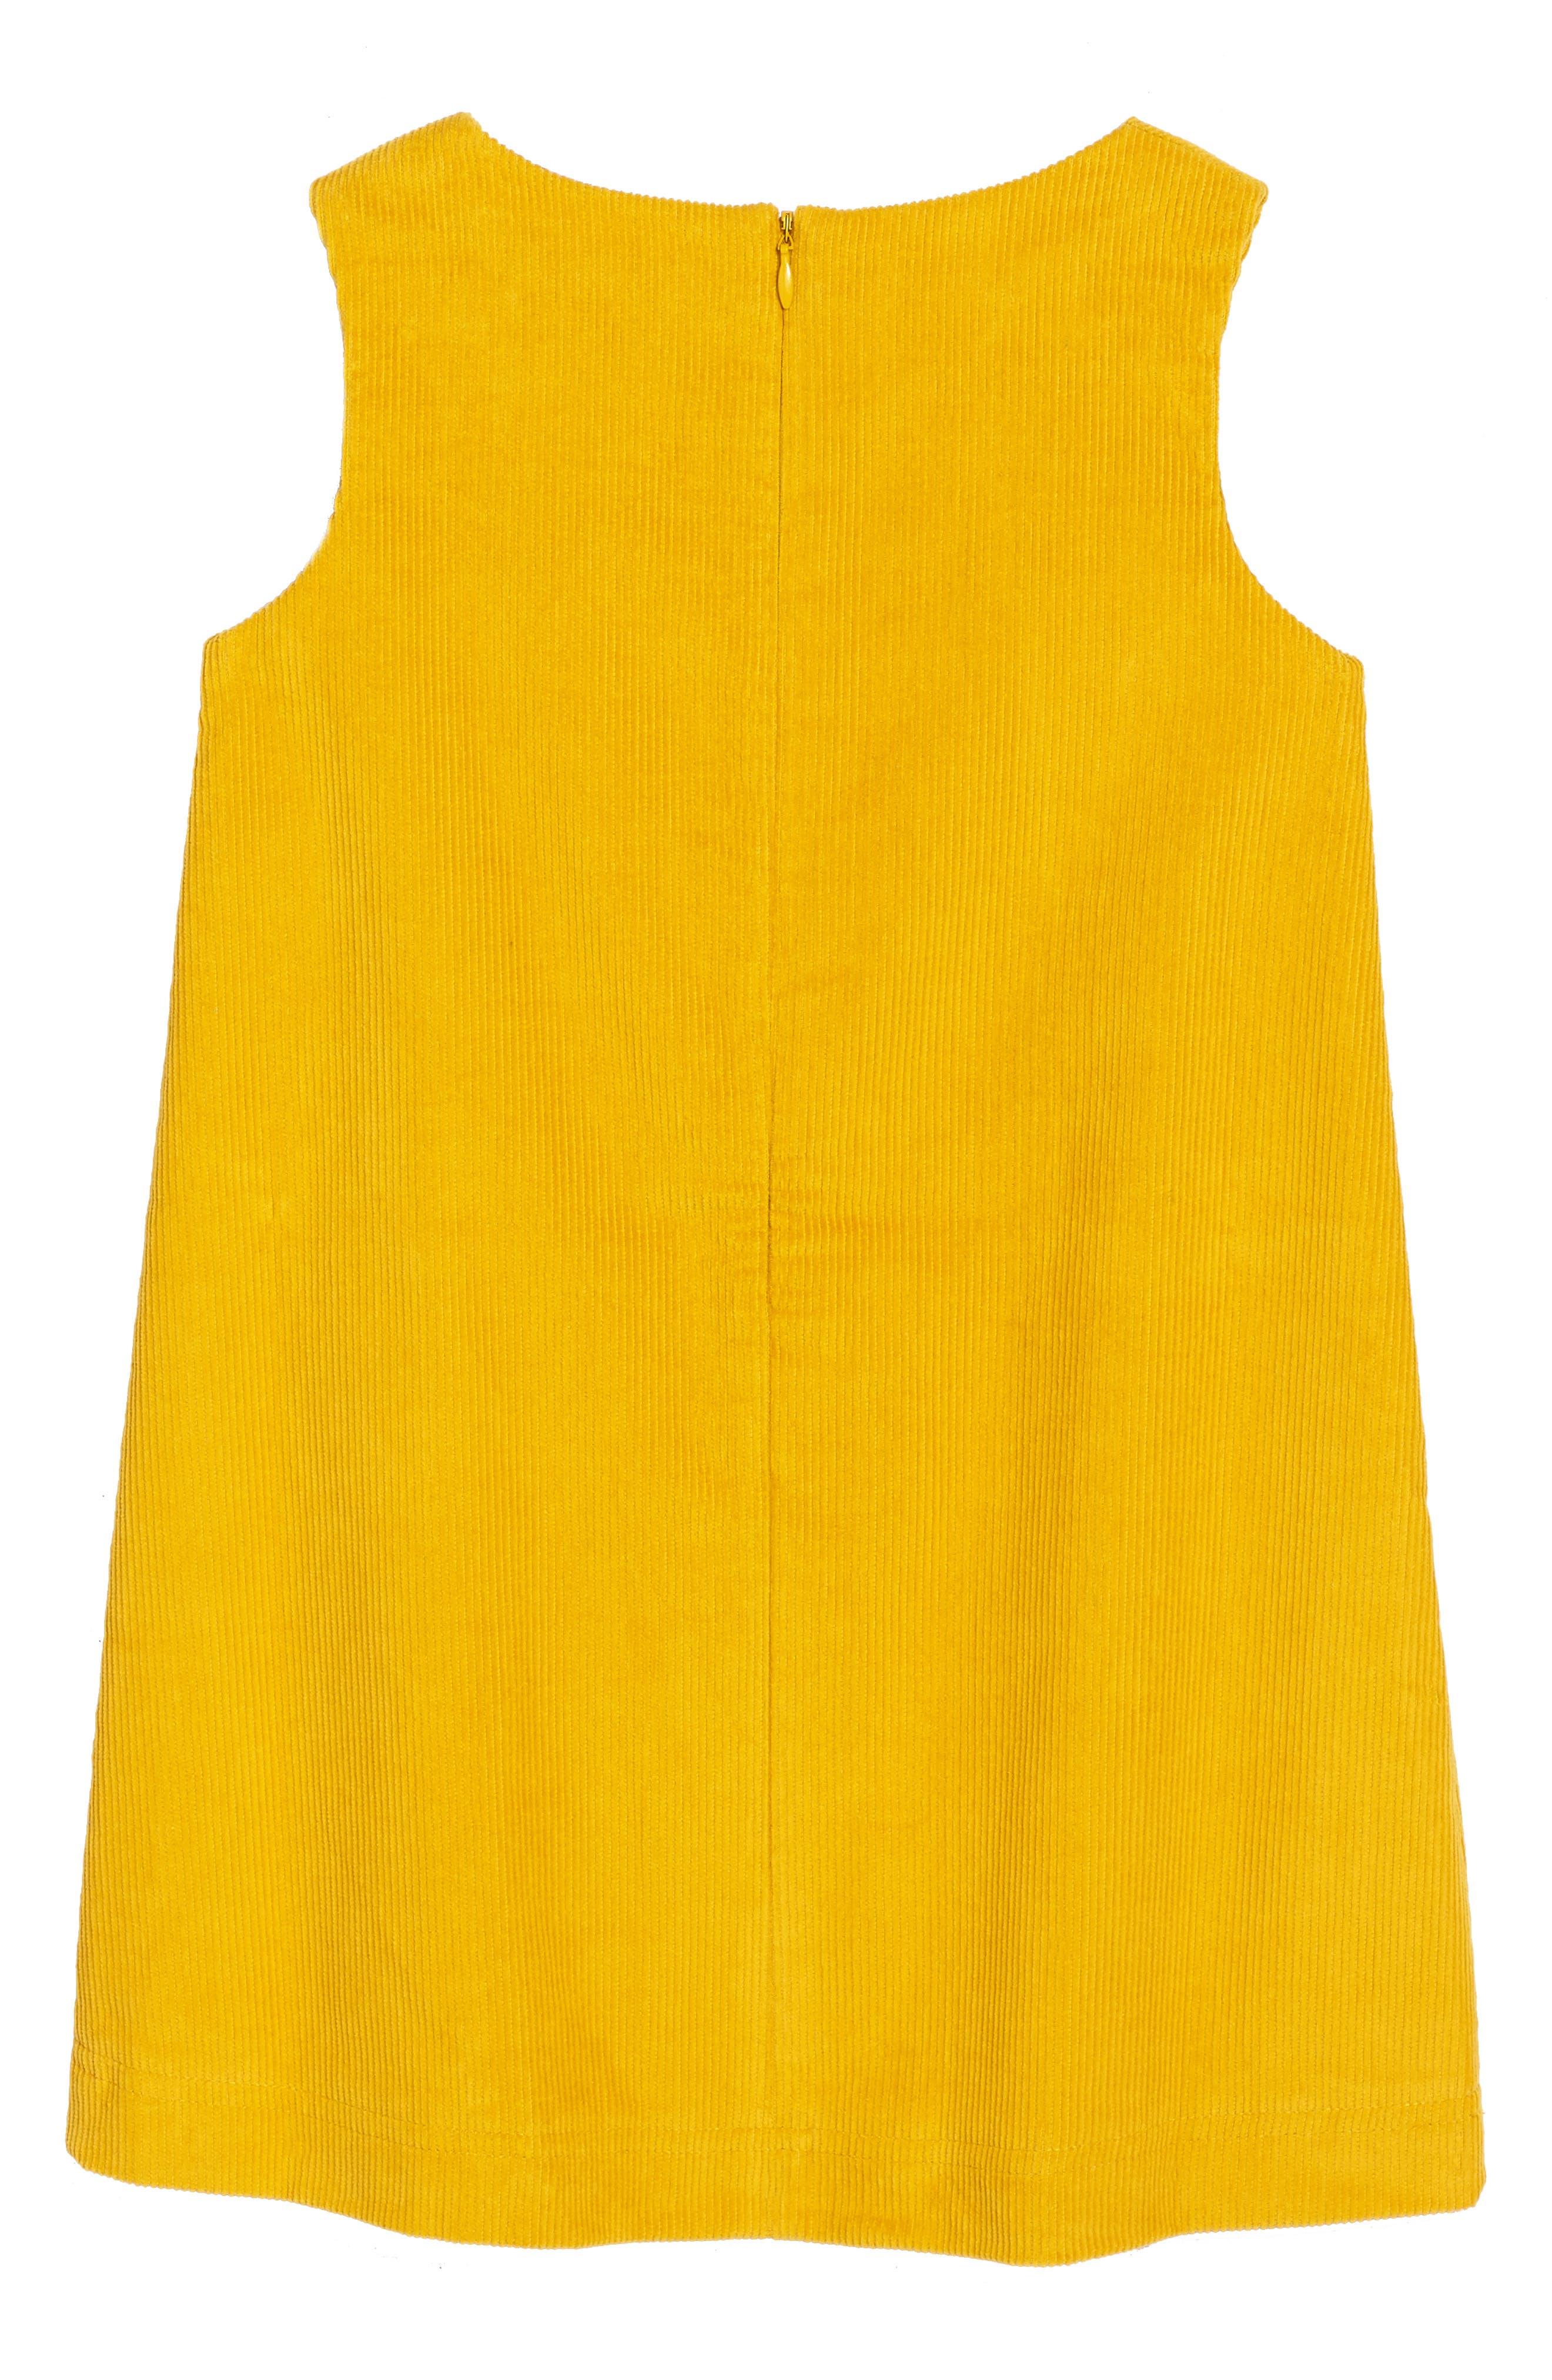 Animal Appliqué Dress,                             Alternate thumbnail 2, color,                             Saffron Yellow Deer Yel